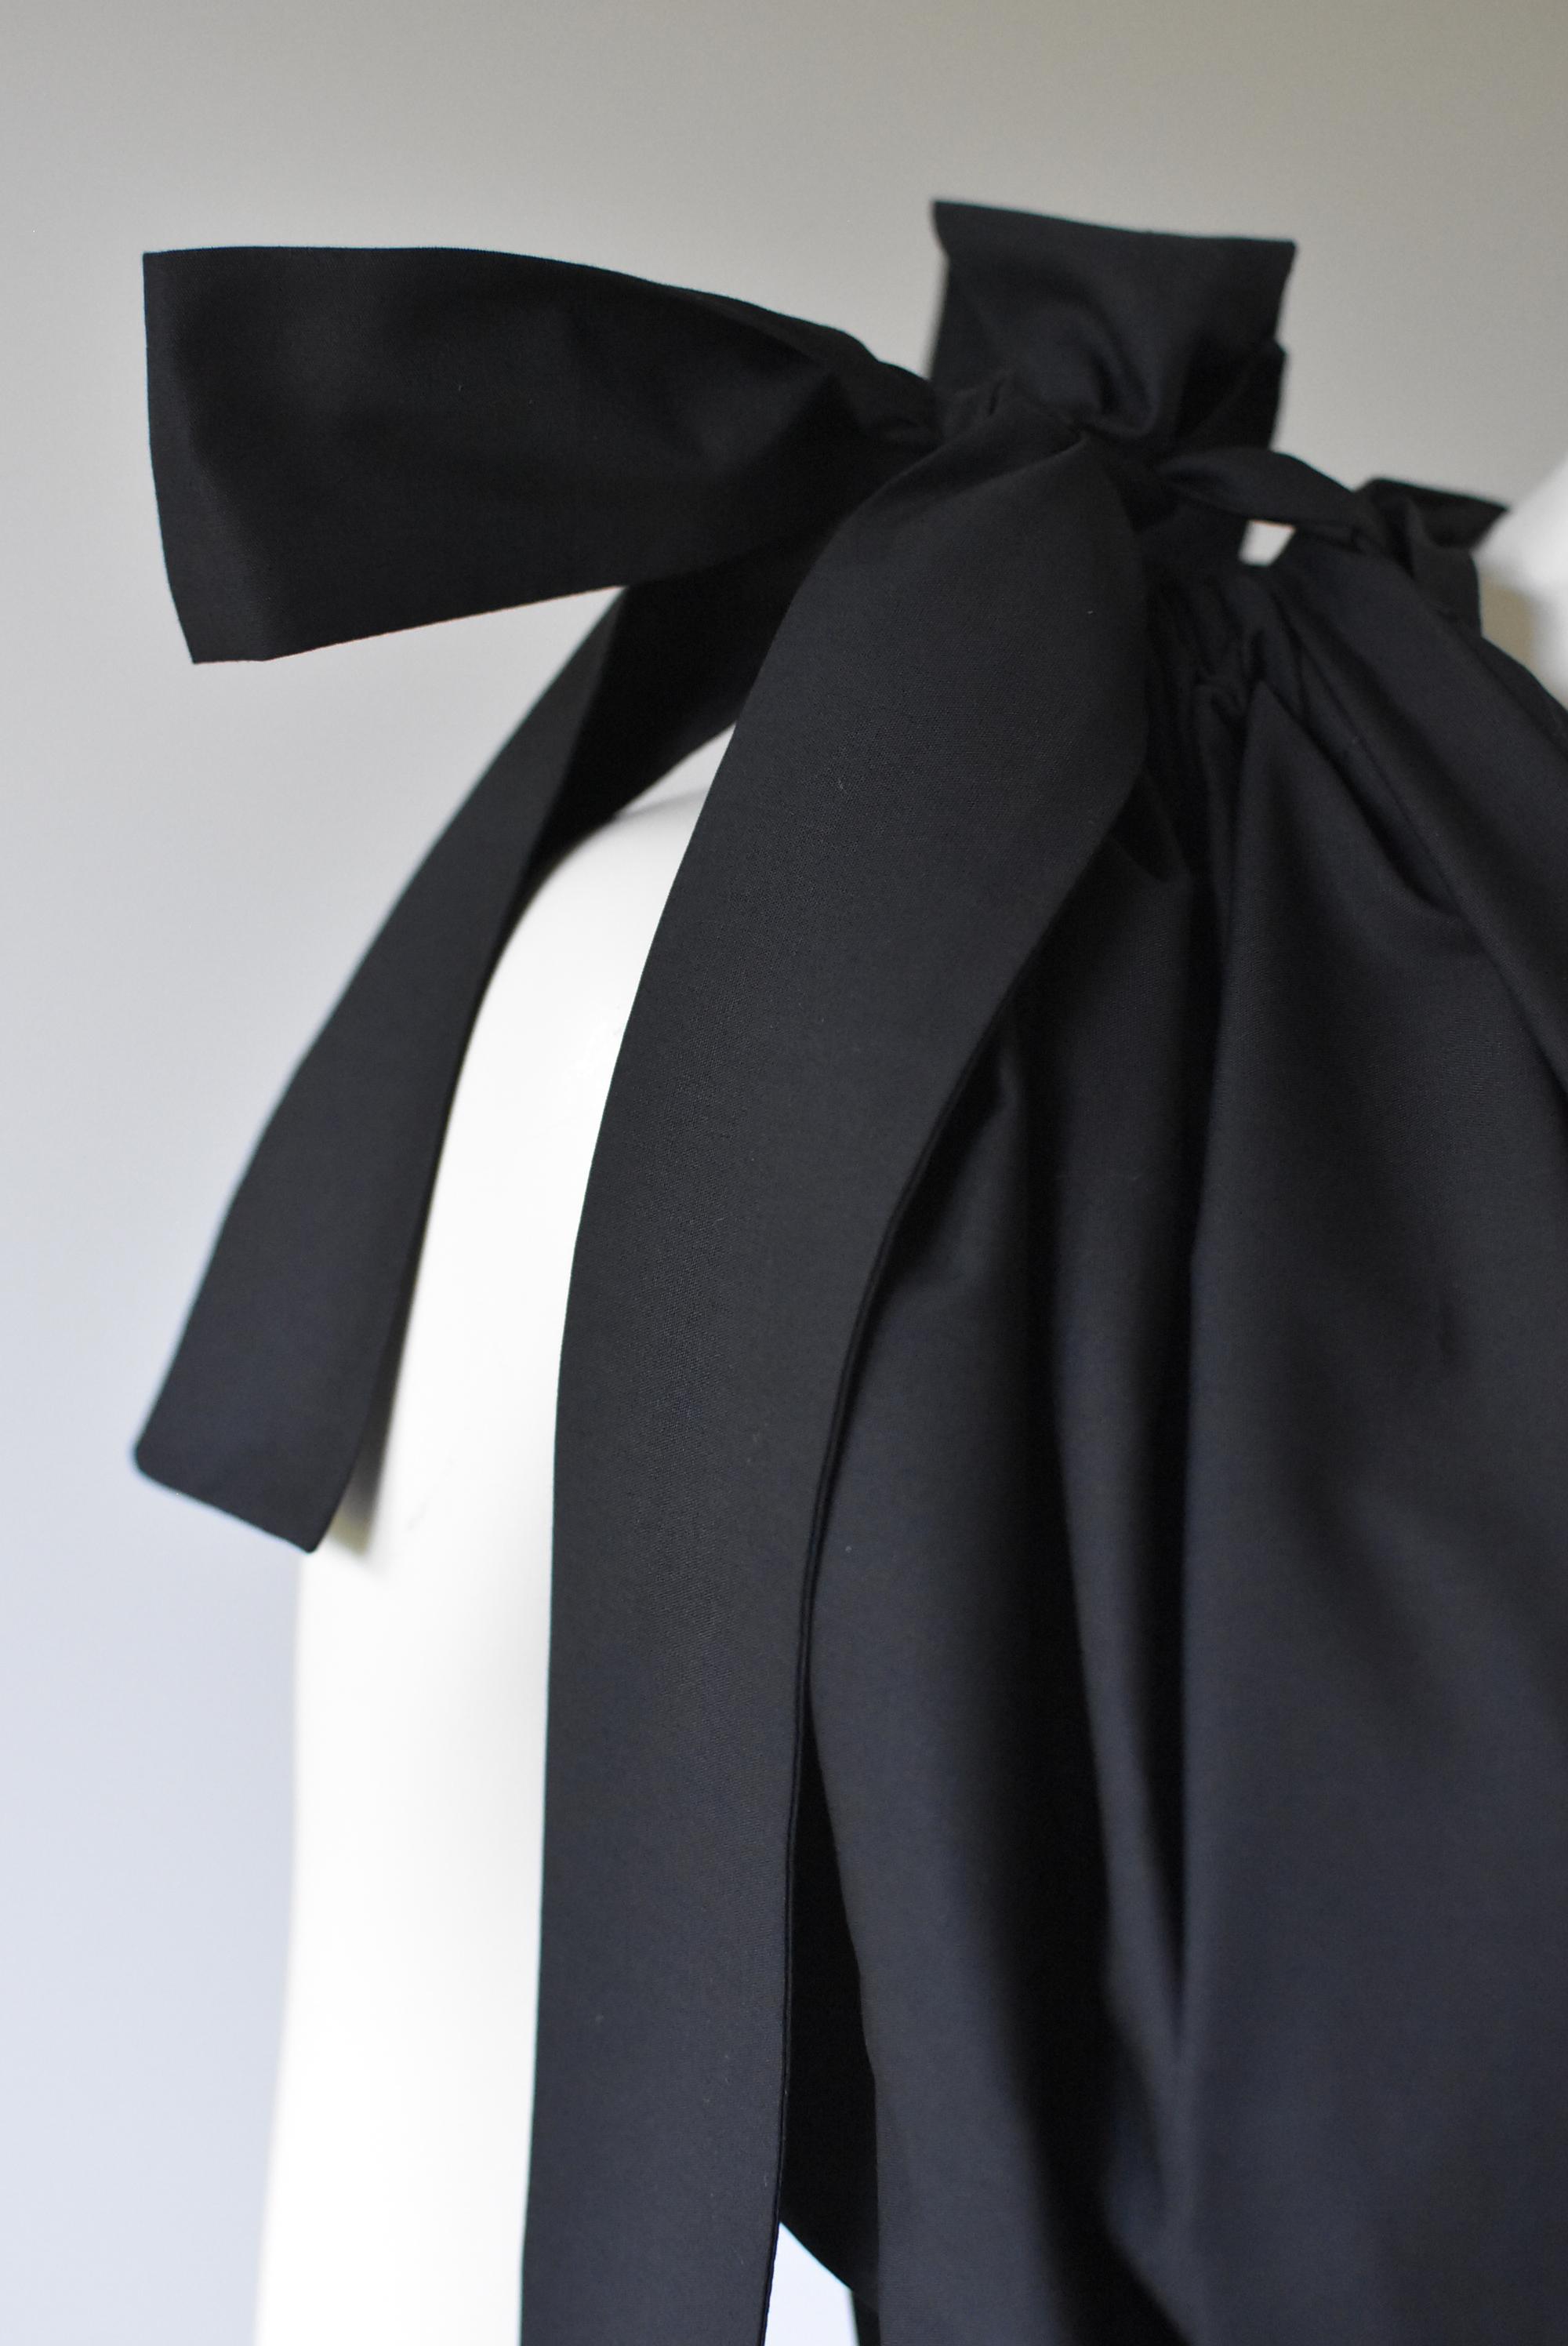 05 - WRAP-IT-UP-DRESS